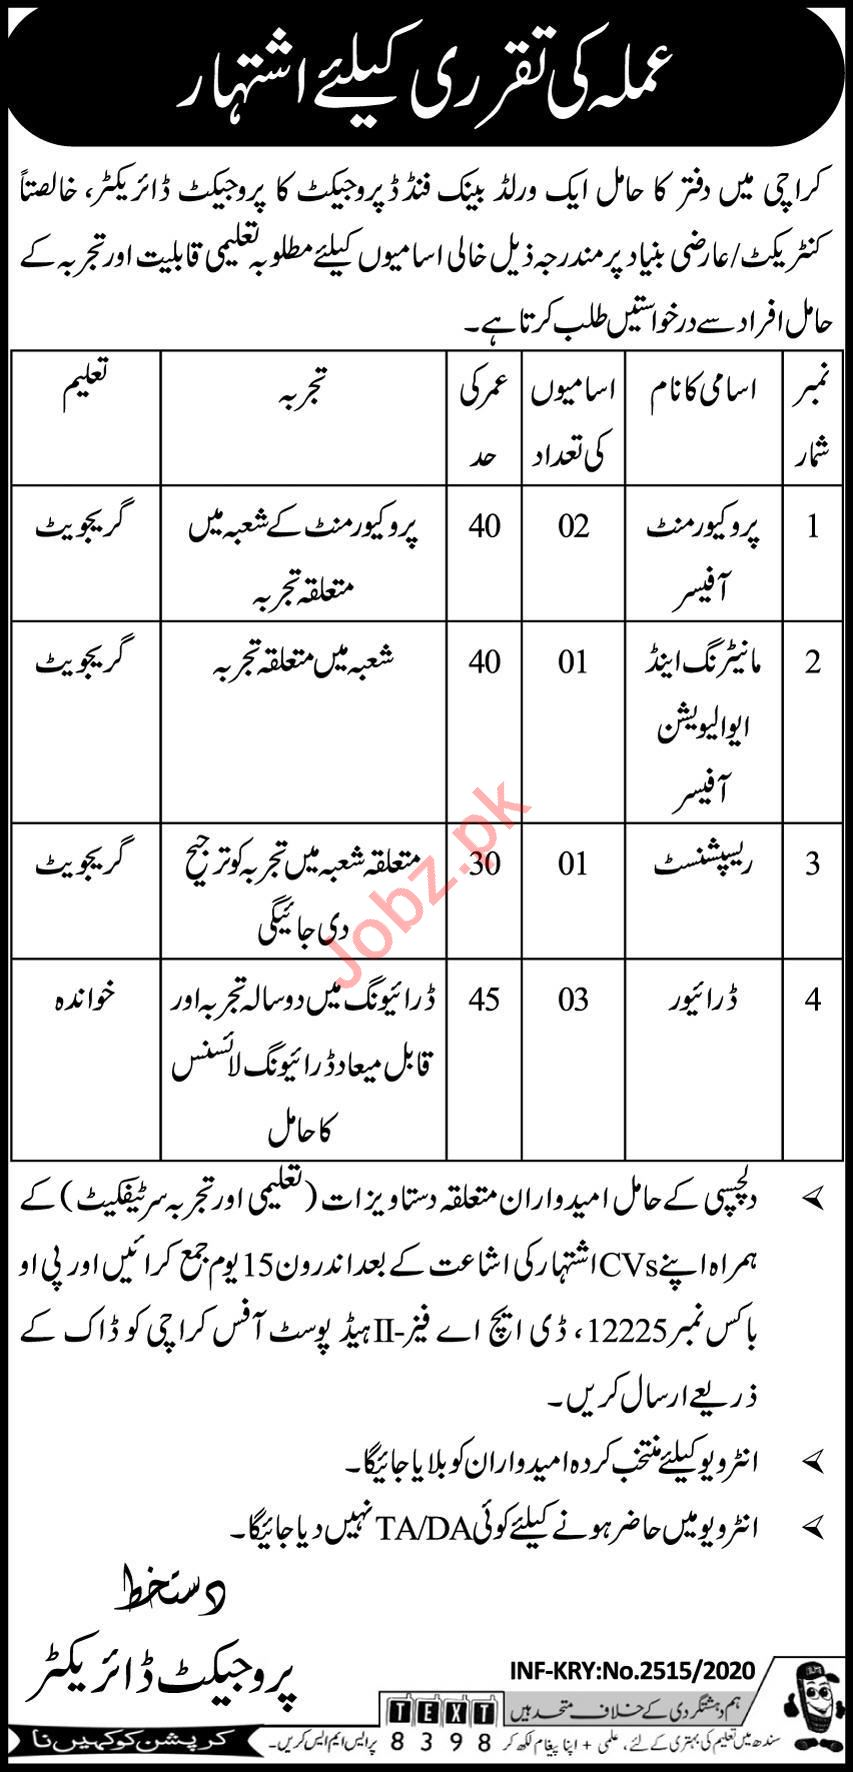 Defence Housing Authority DHA Karachi Jobs 2020